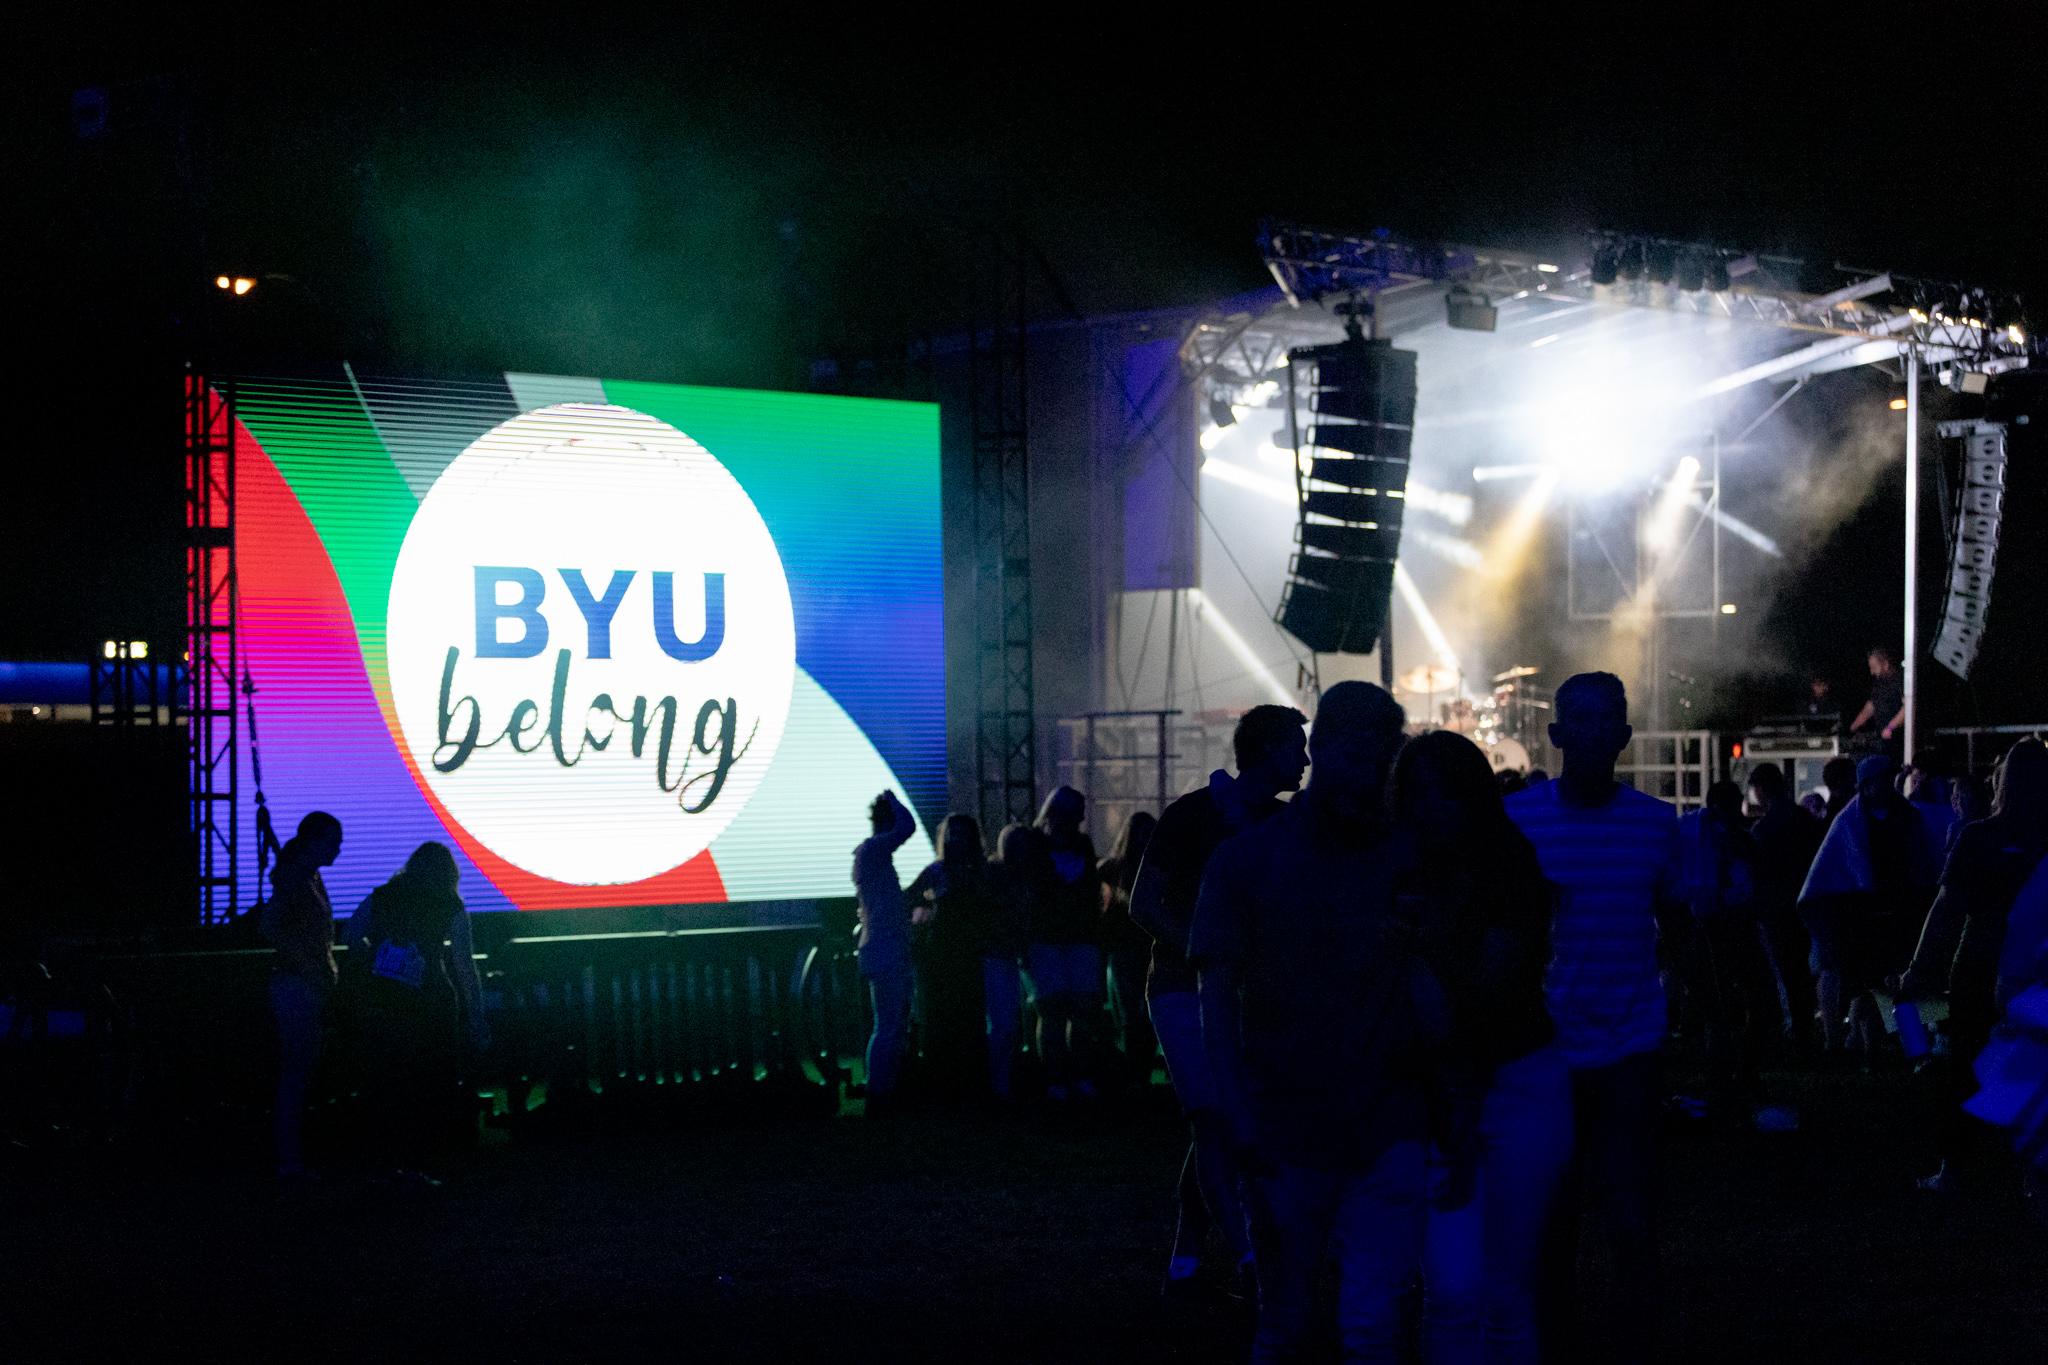 BYU Belong Concert